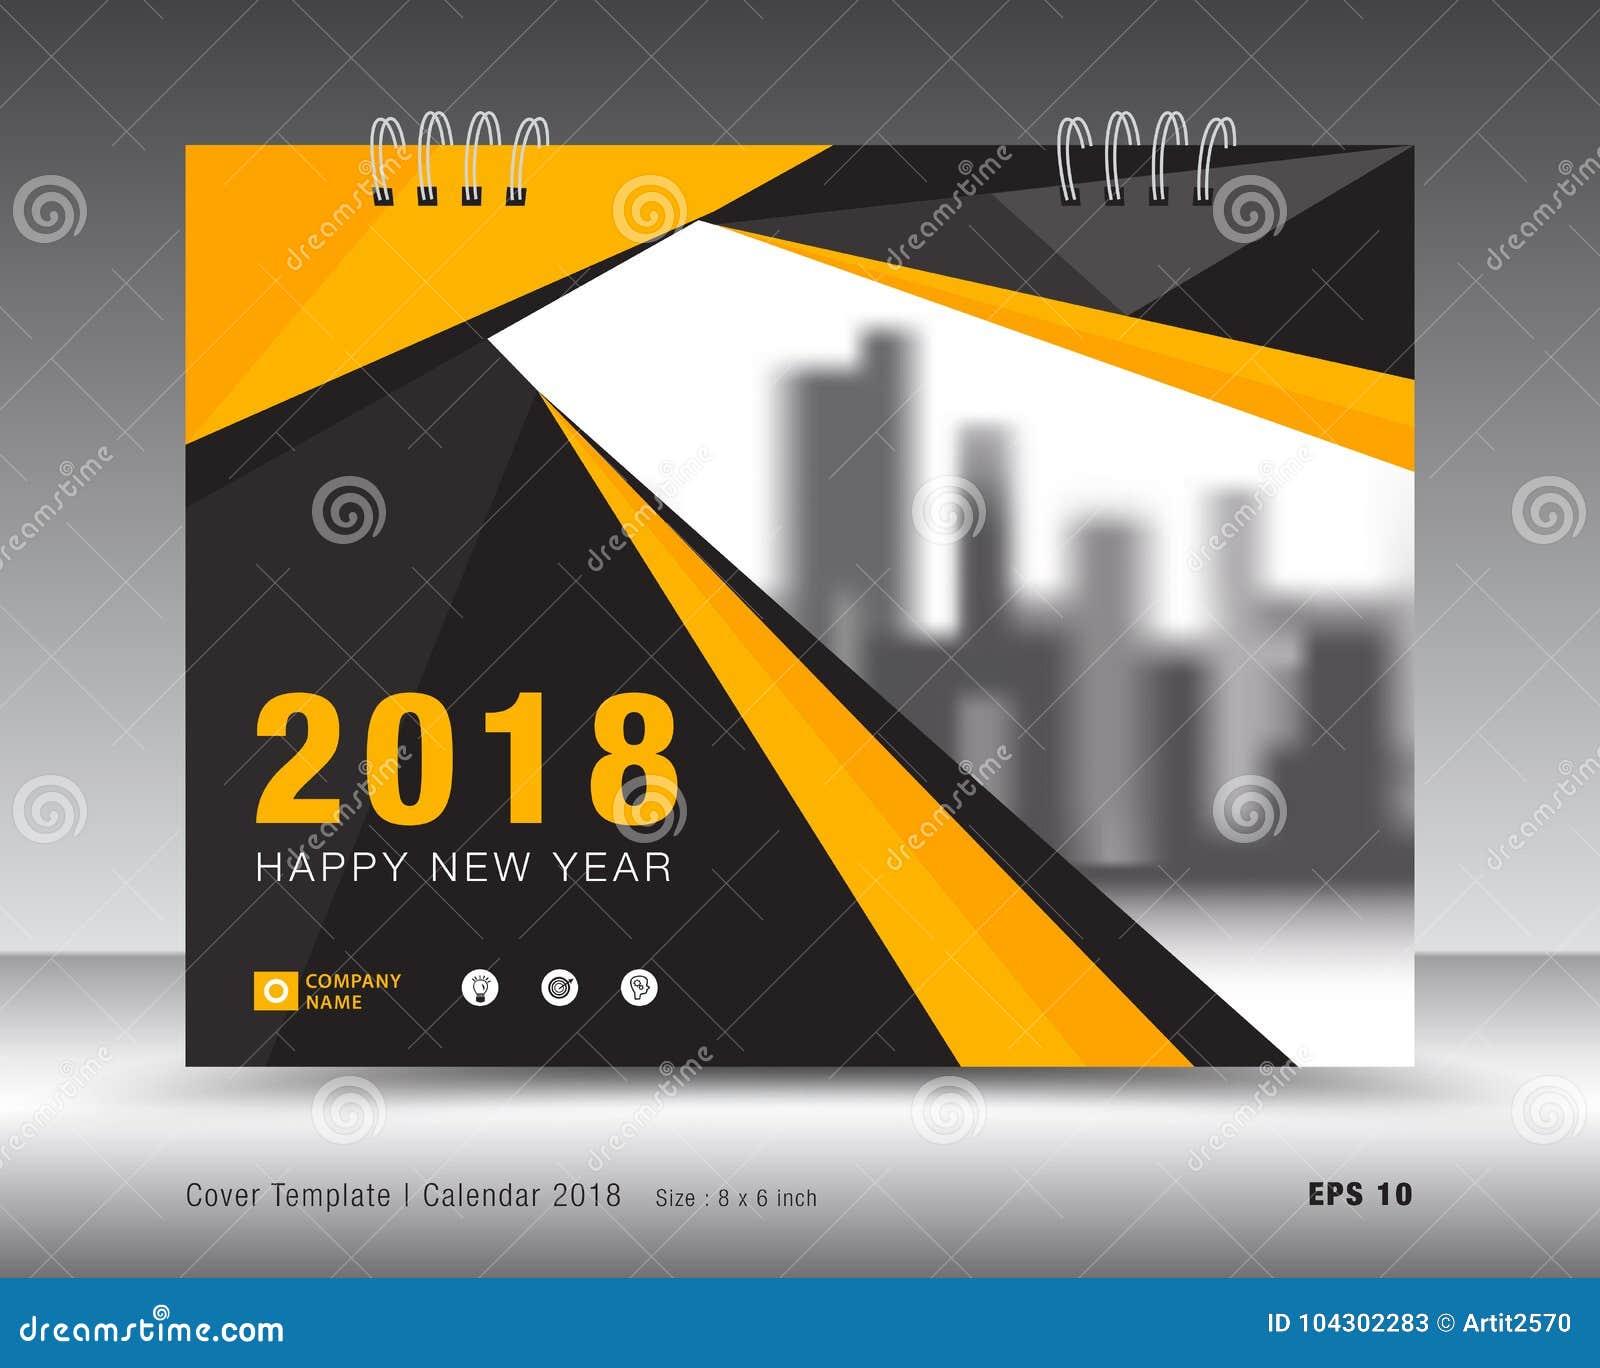 Yellow Cover Calendar 2018 Template Booklet Cover Stock Vector